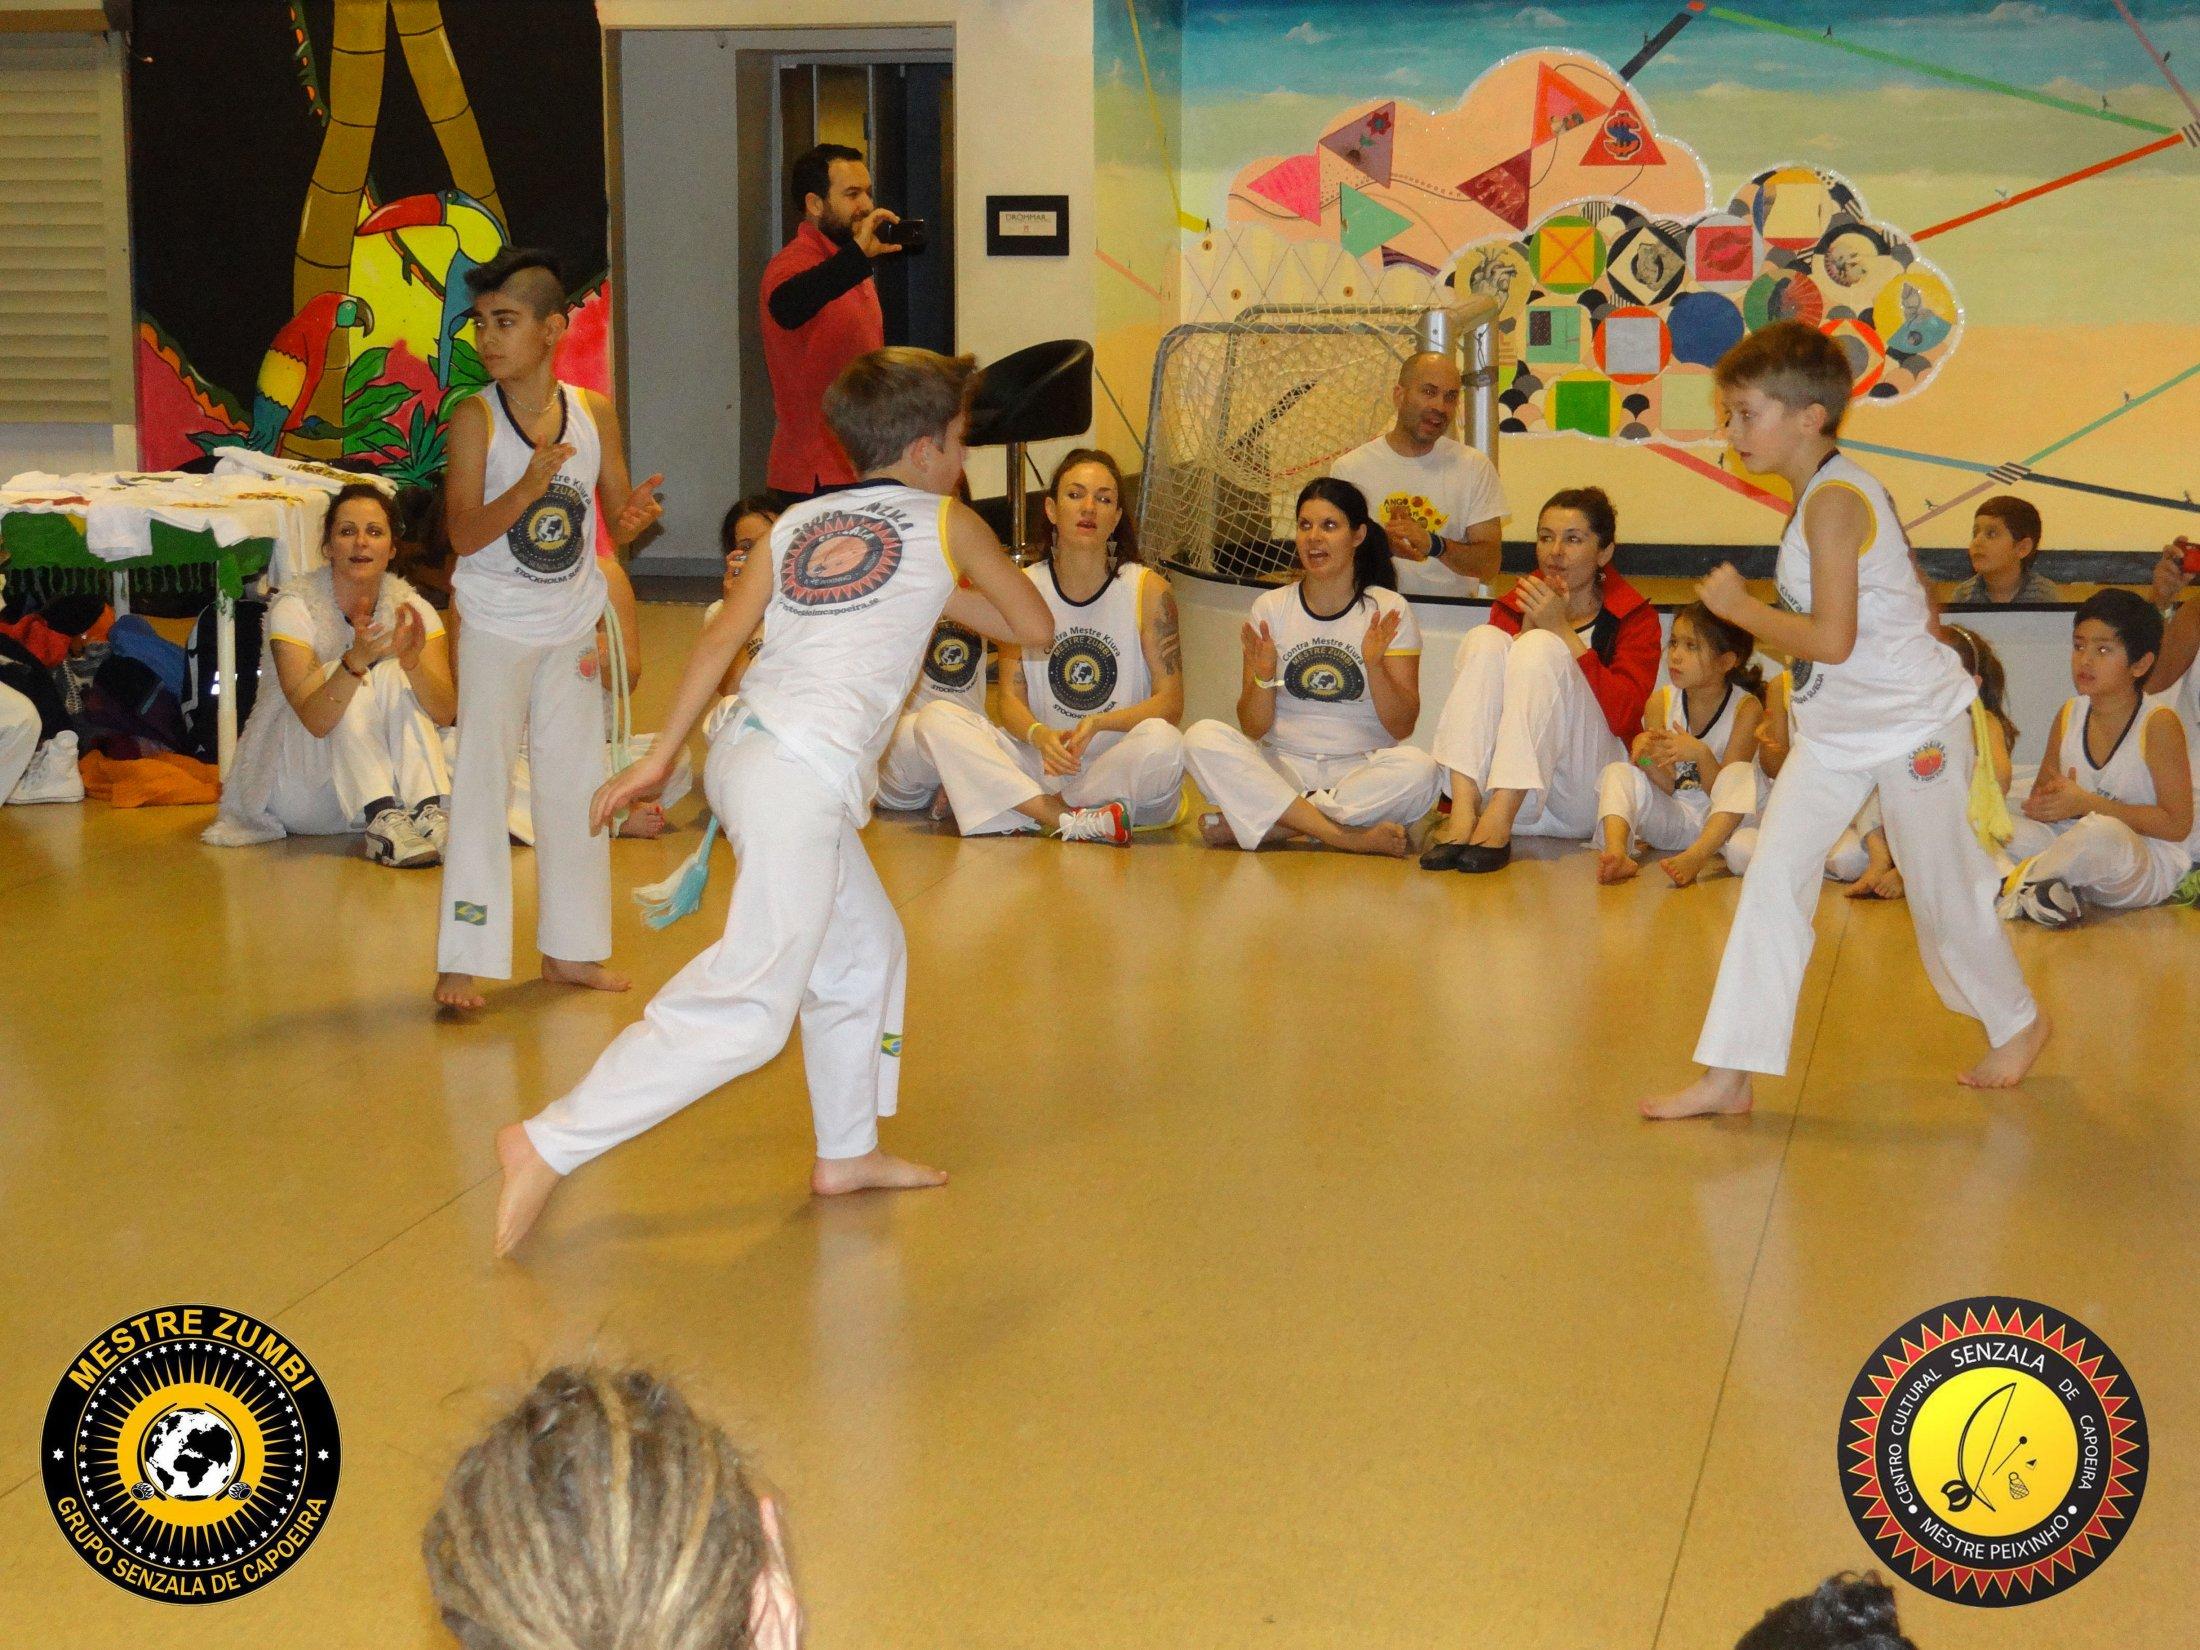 2013-12-14 - Capoeira 035